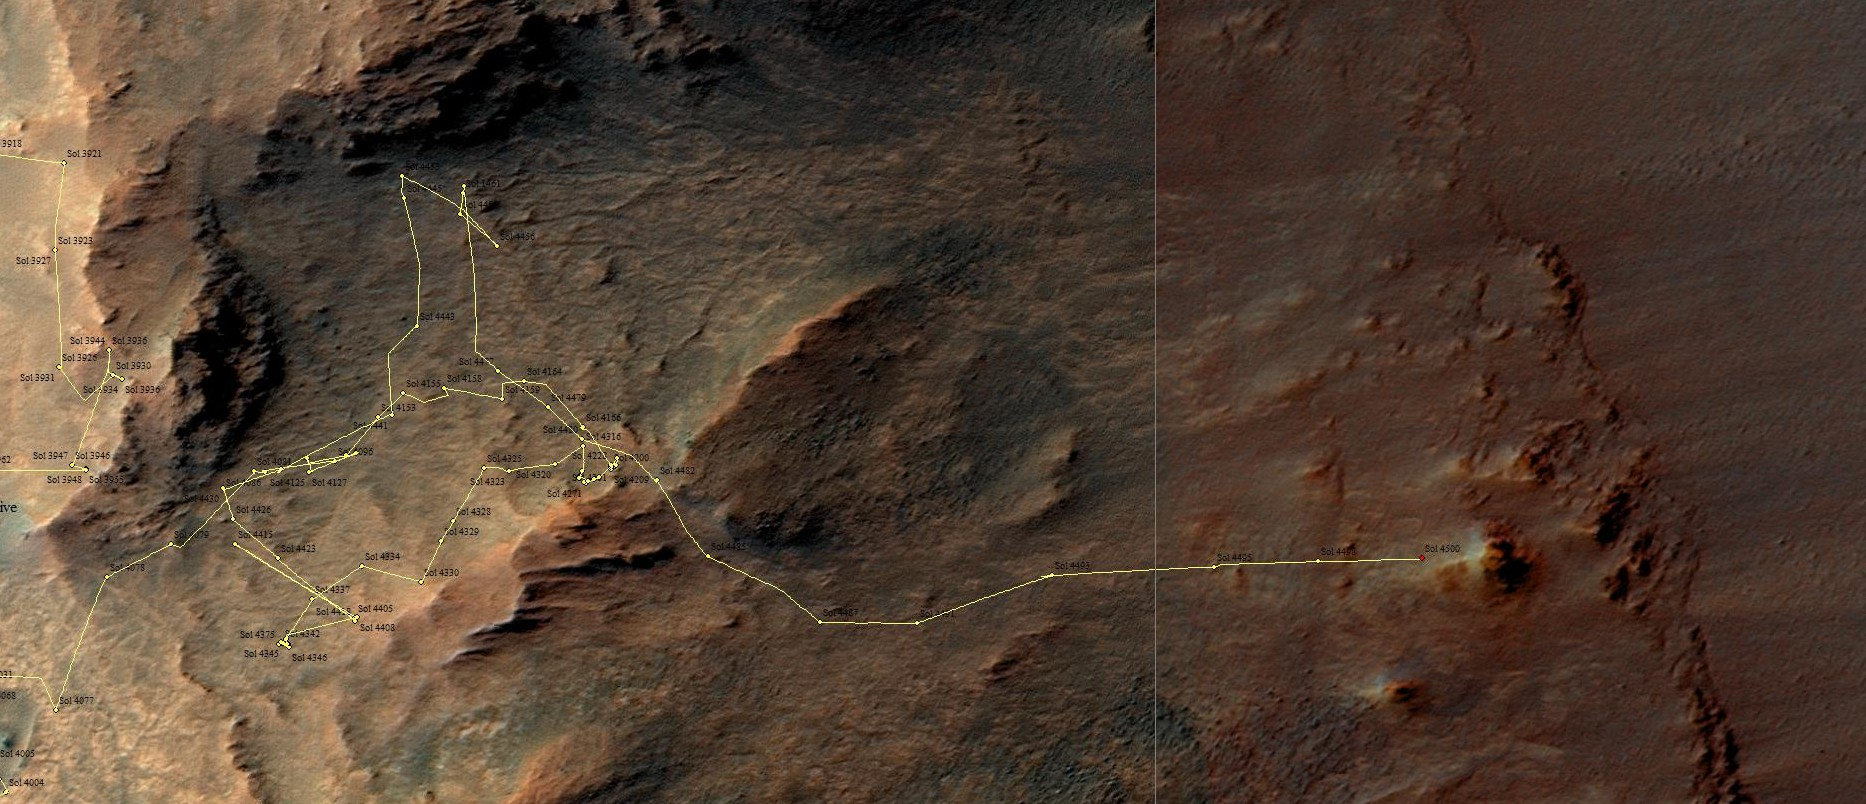 merb_sol4500_1-detail